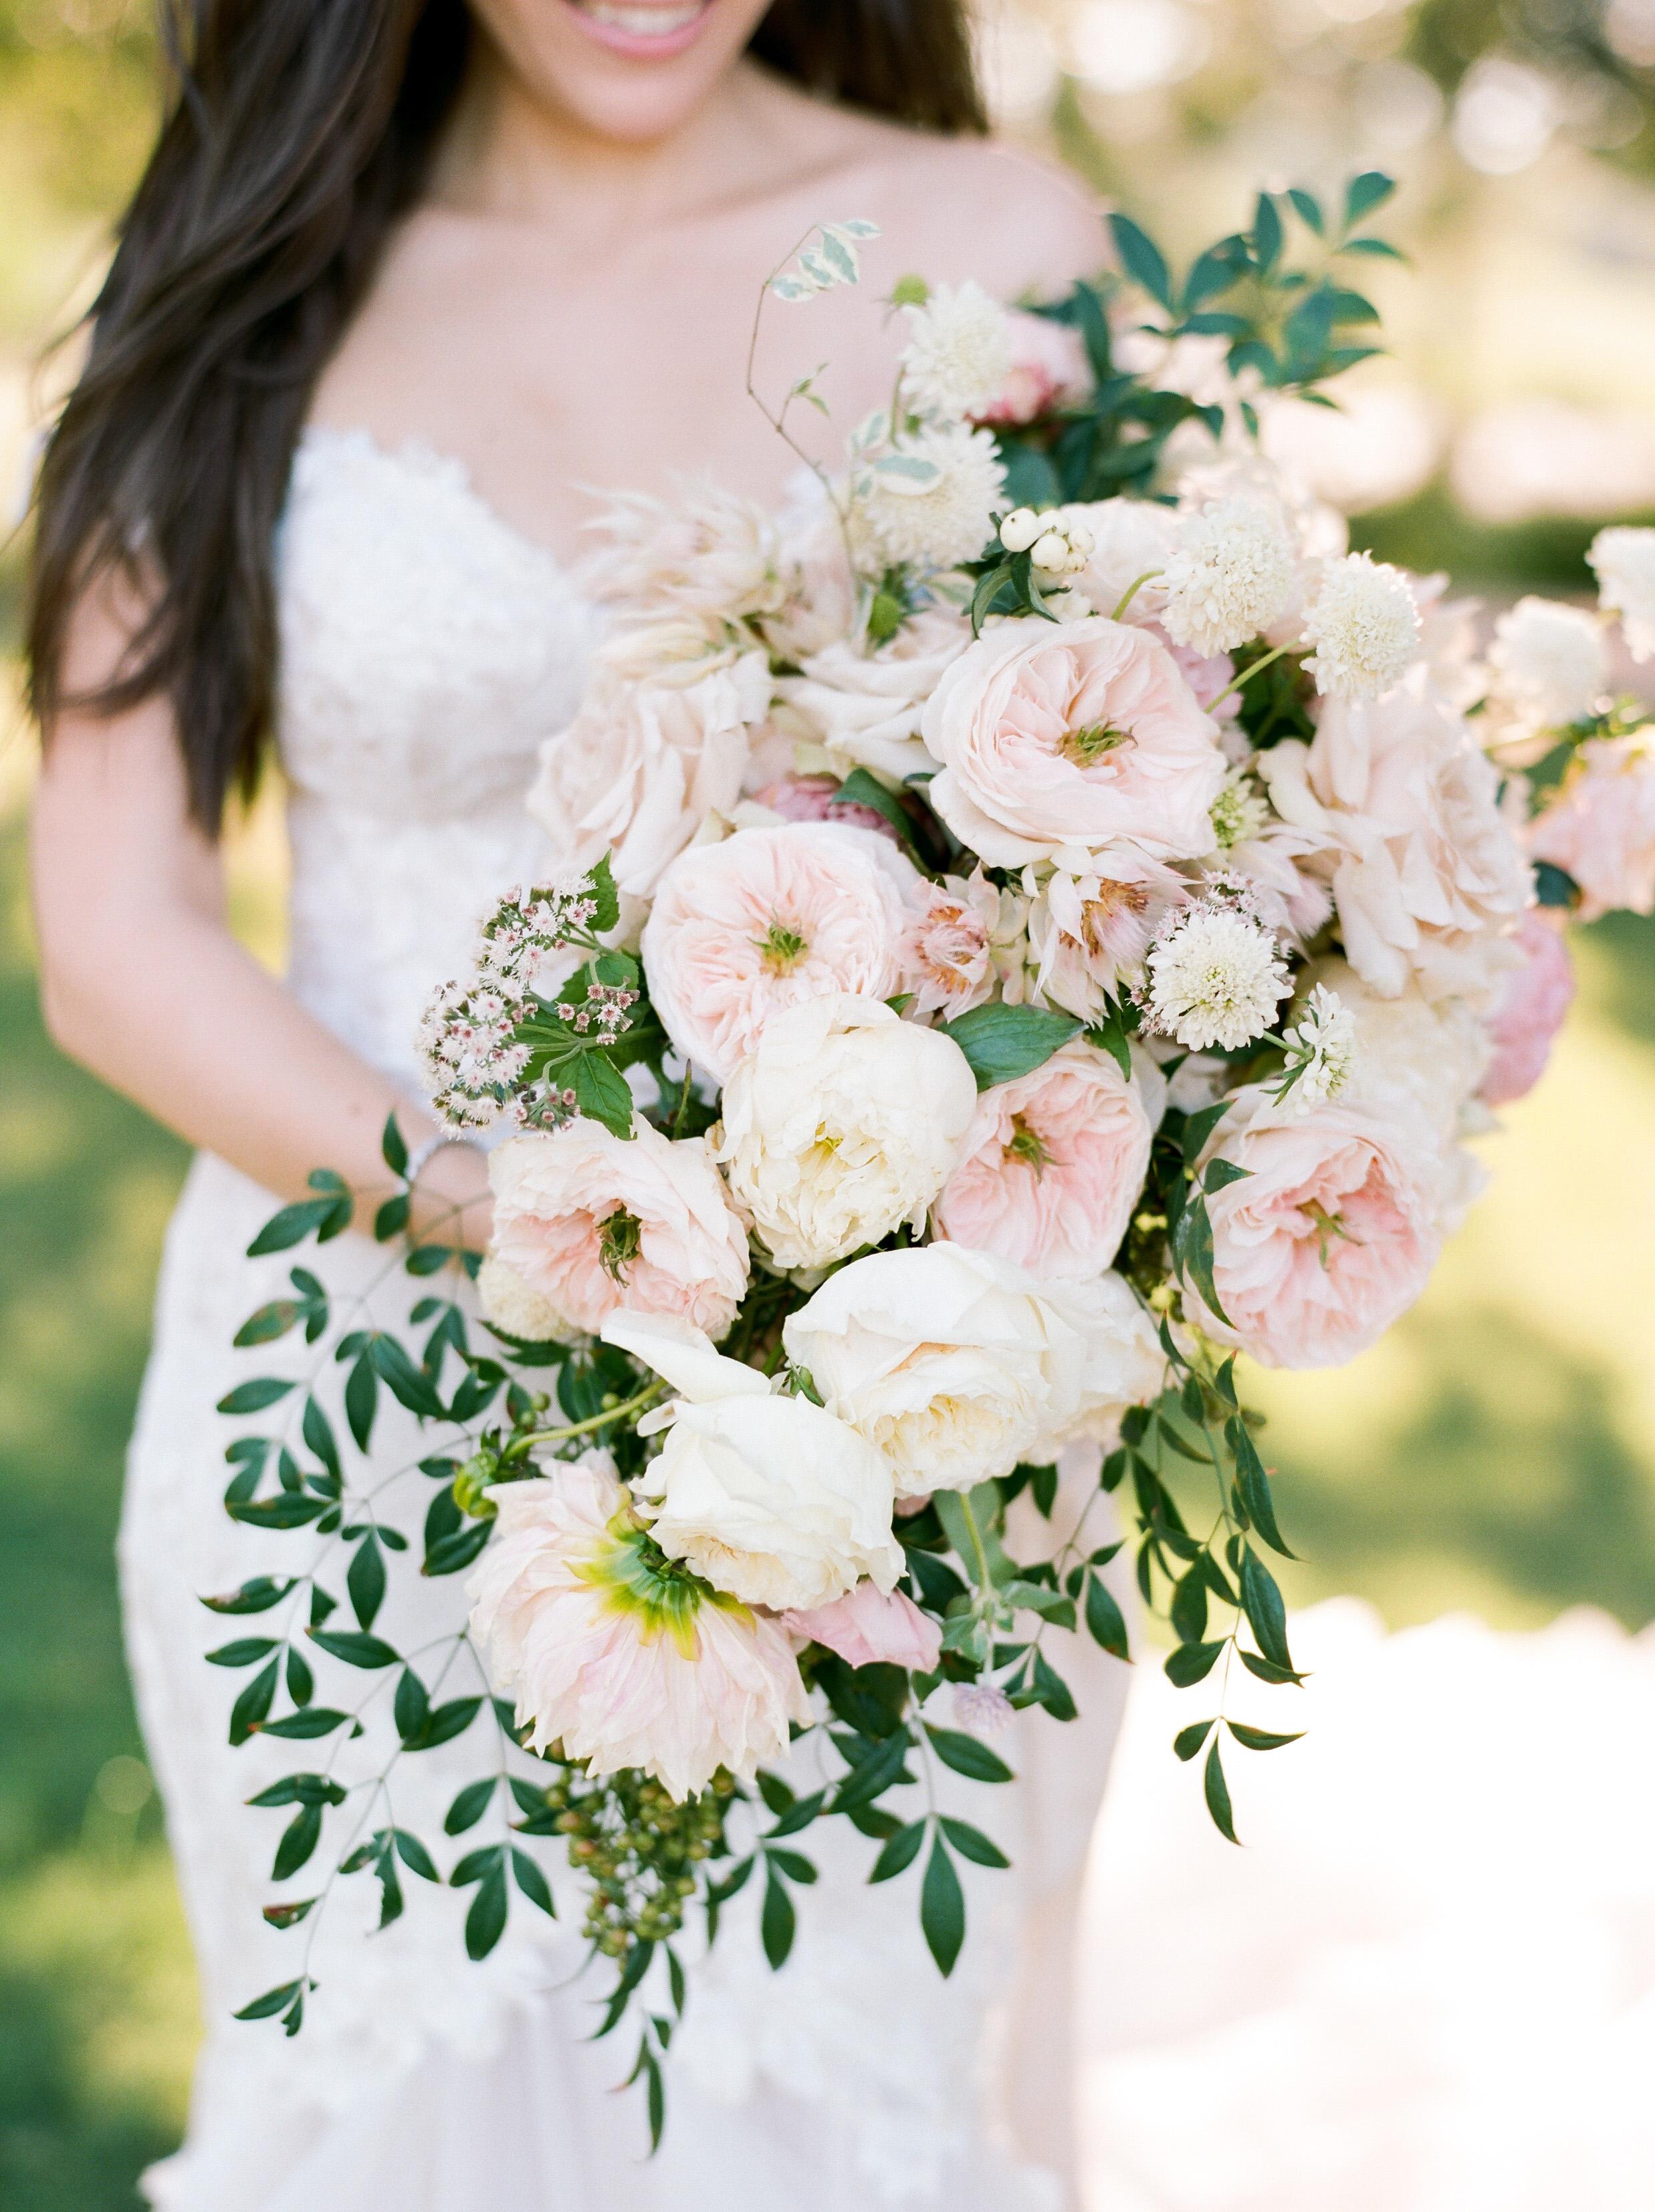 Martha-Stewart-Wedding-Dana-Fernandez-Photography-Josh-Texas-Film-Houston-Wedding-Fine-Art-Photographer-McGovern-Centennial-Gardens-Top-Best-177.jpg